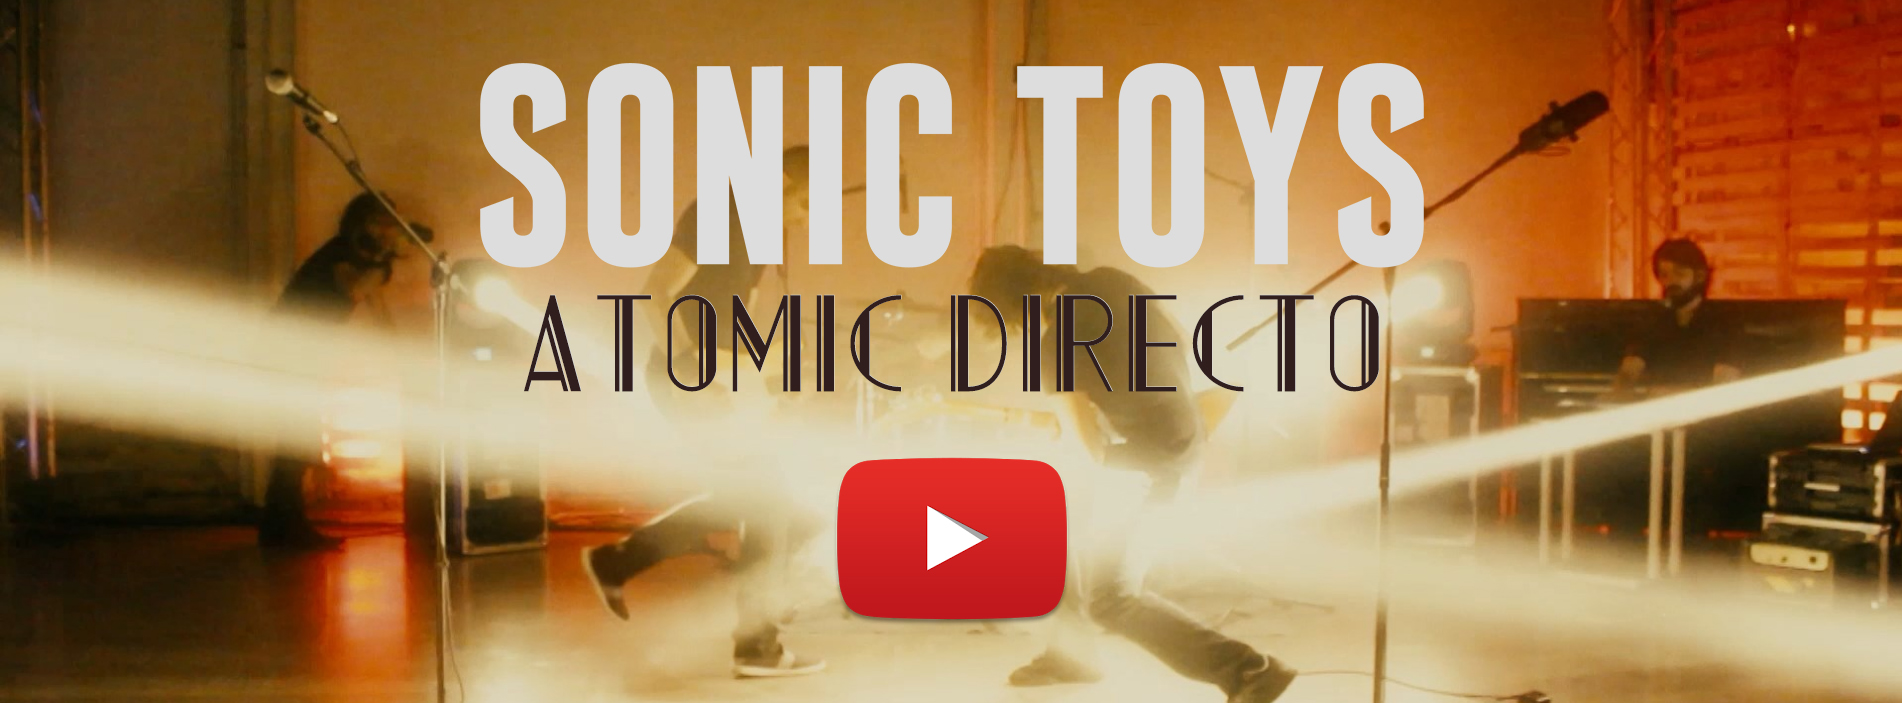 atomic directo pc